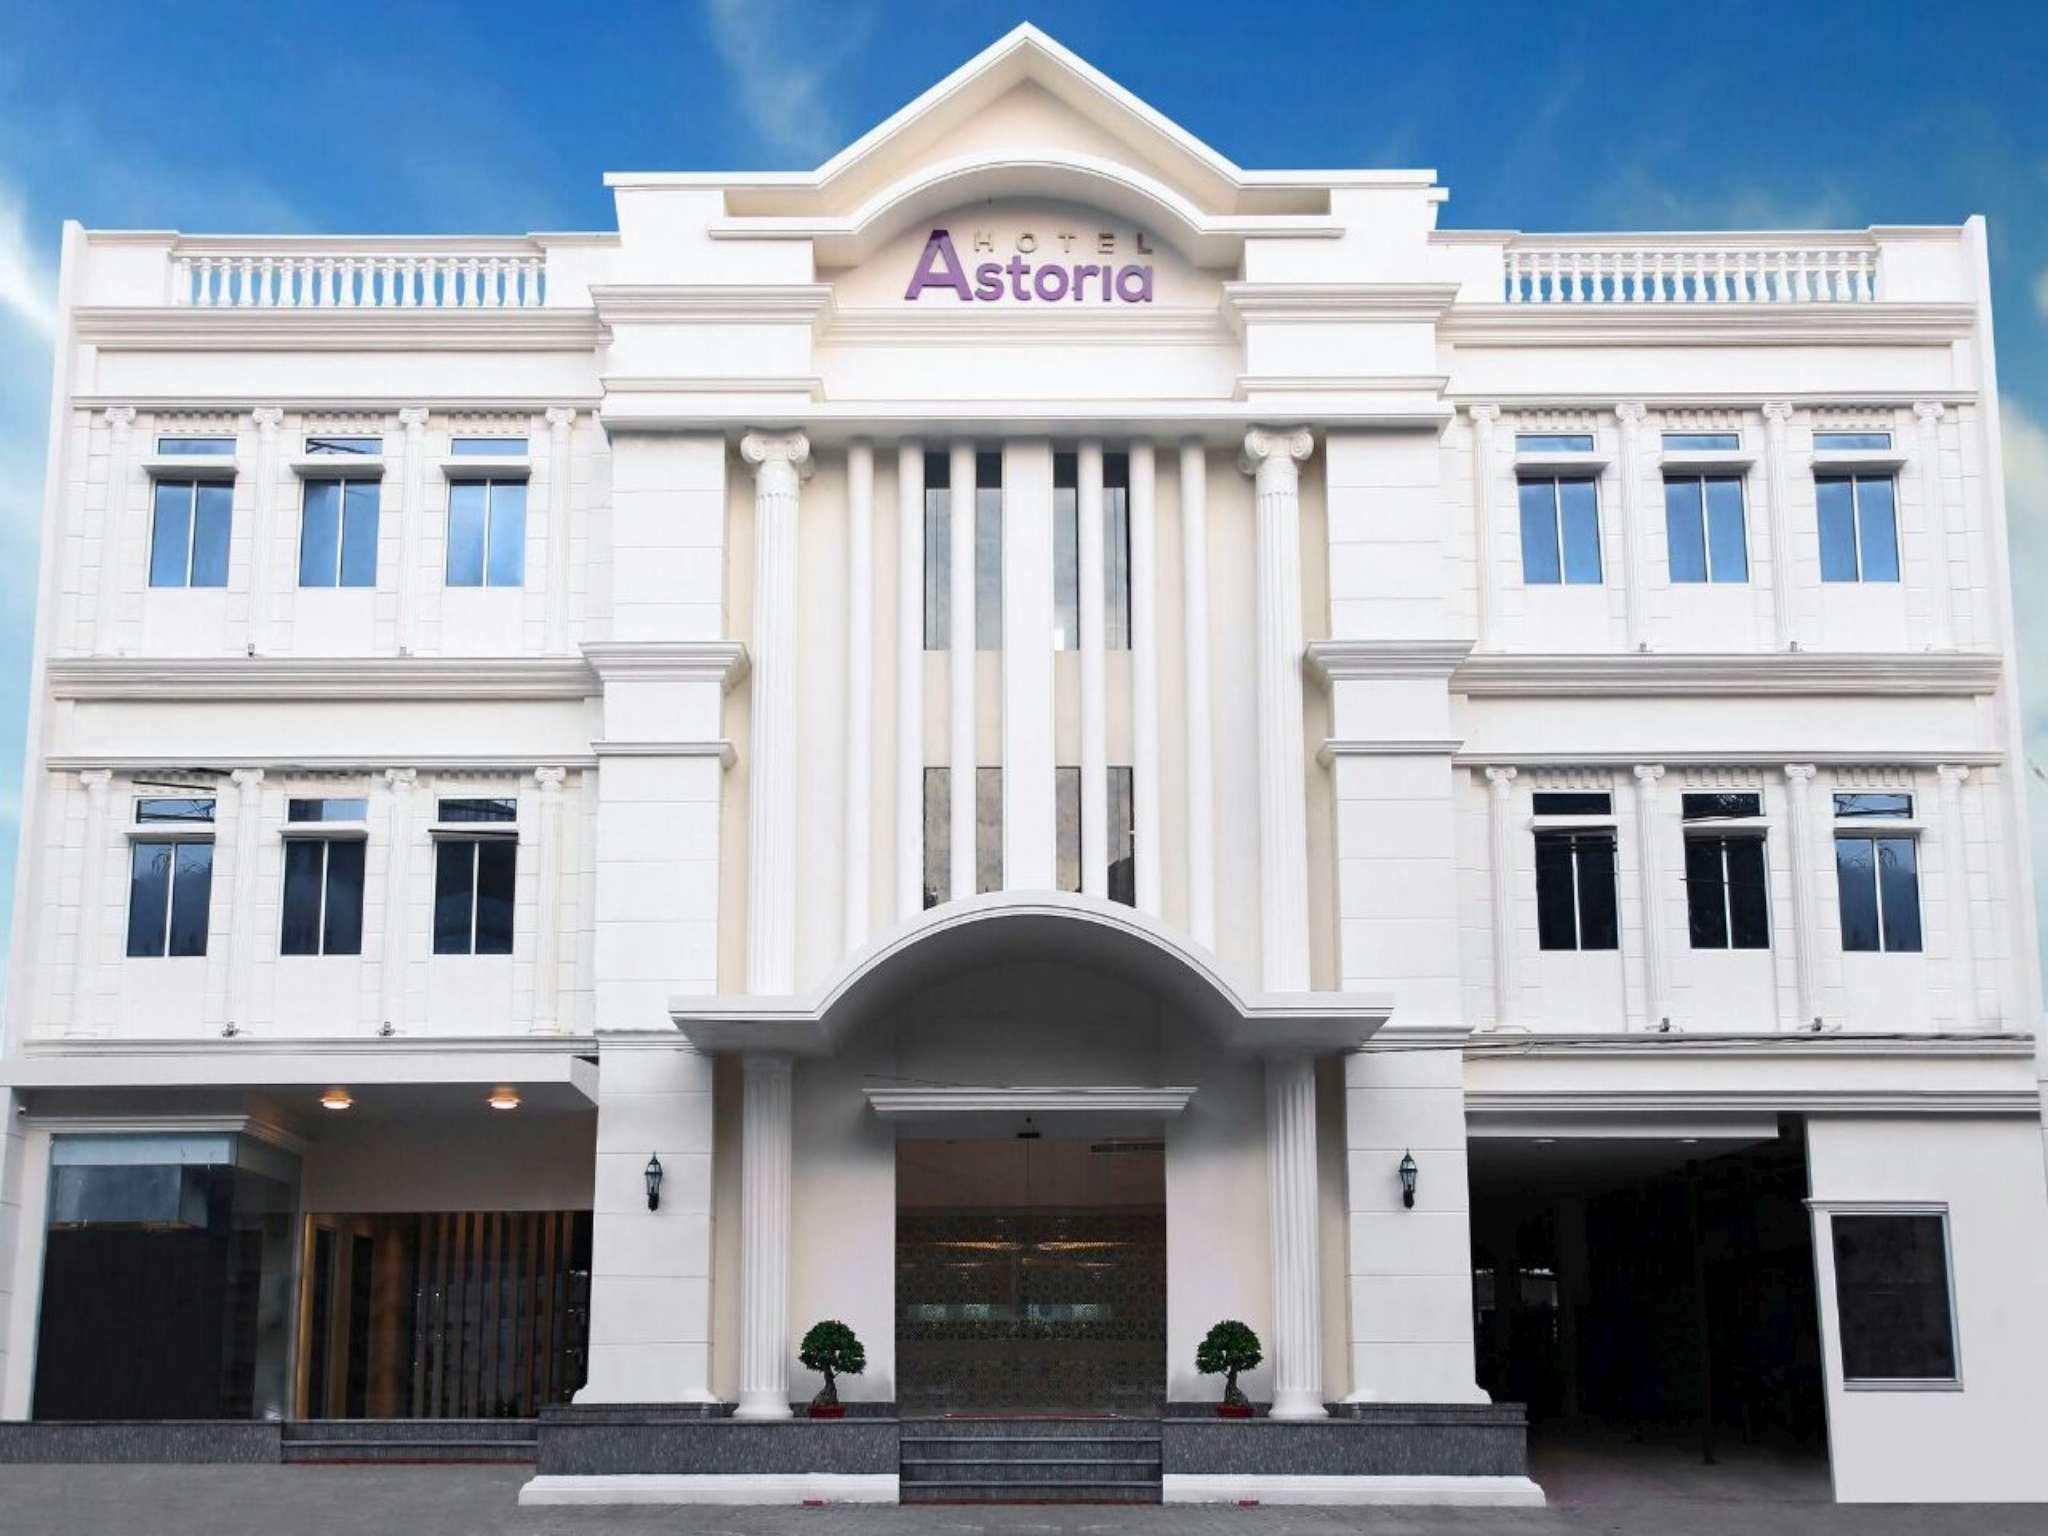 Hotel Astoria, Bandar Lampung